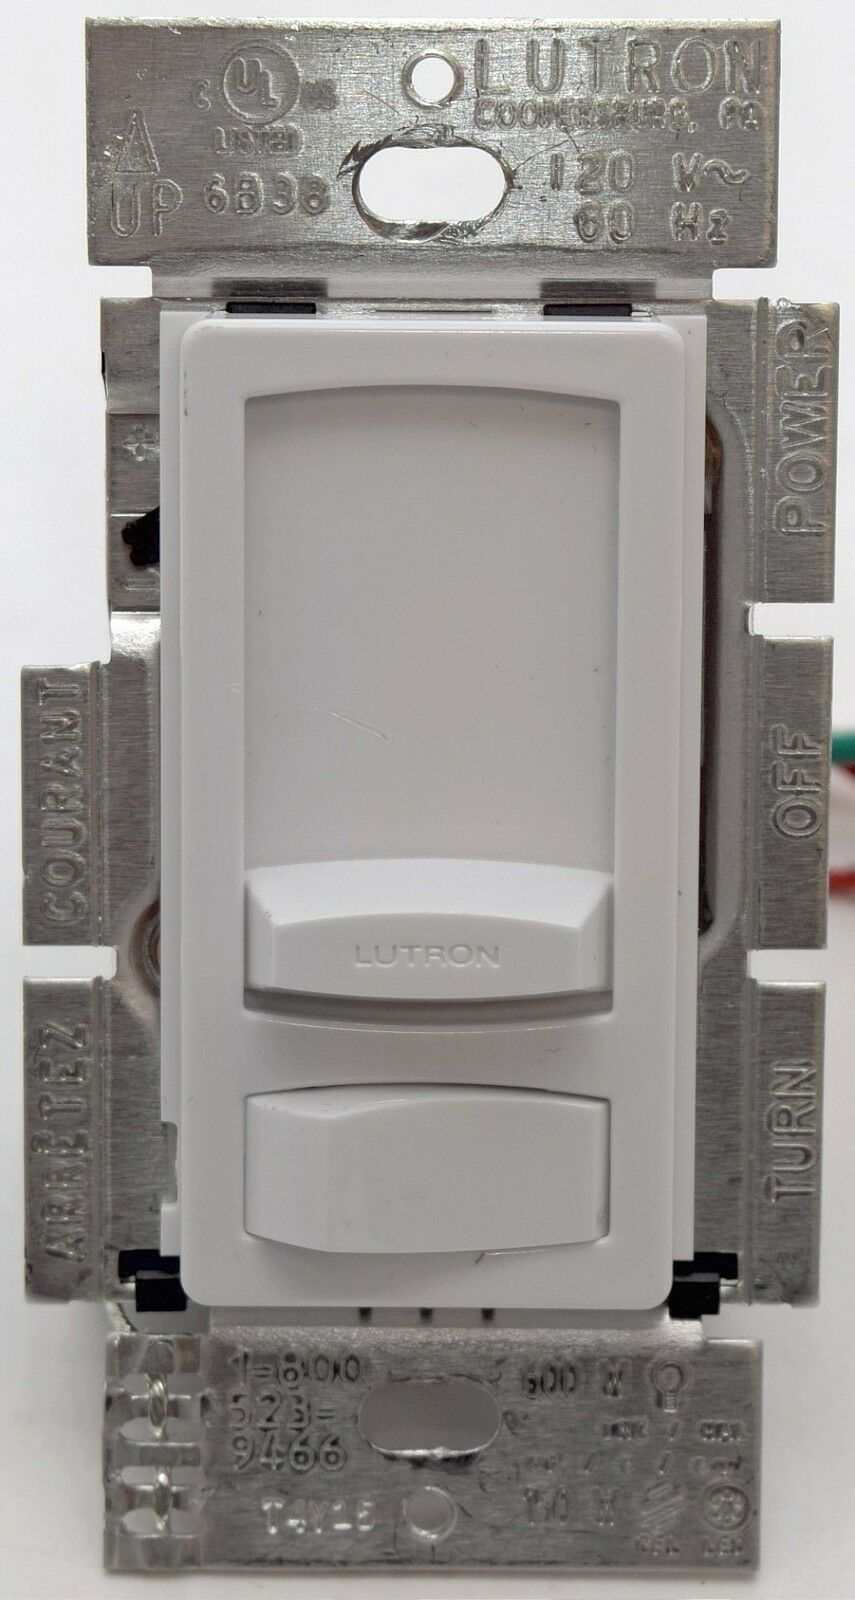 Lutron Skylark Contour Ctcl 153p Single Pole 3 Way Dimmer Light Switch Black White Oem